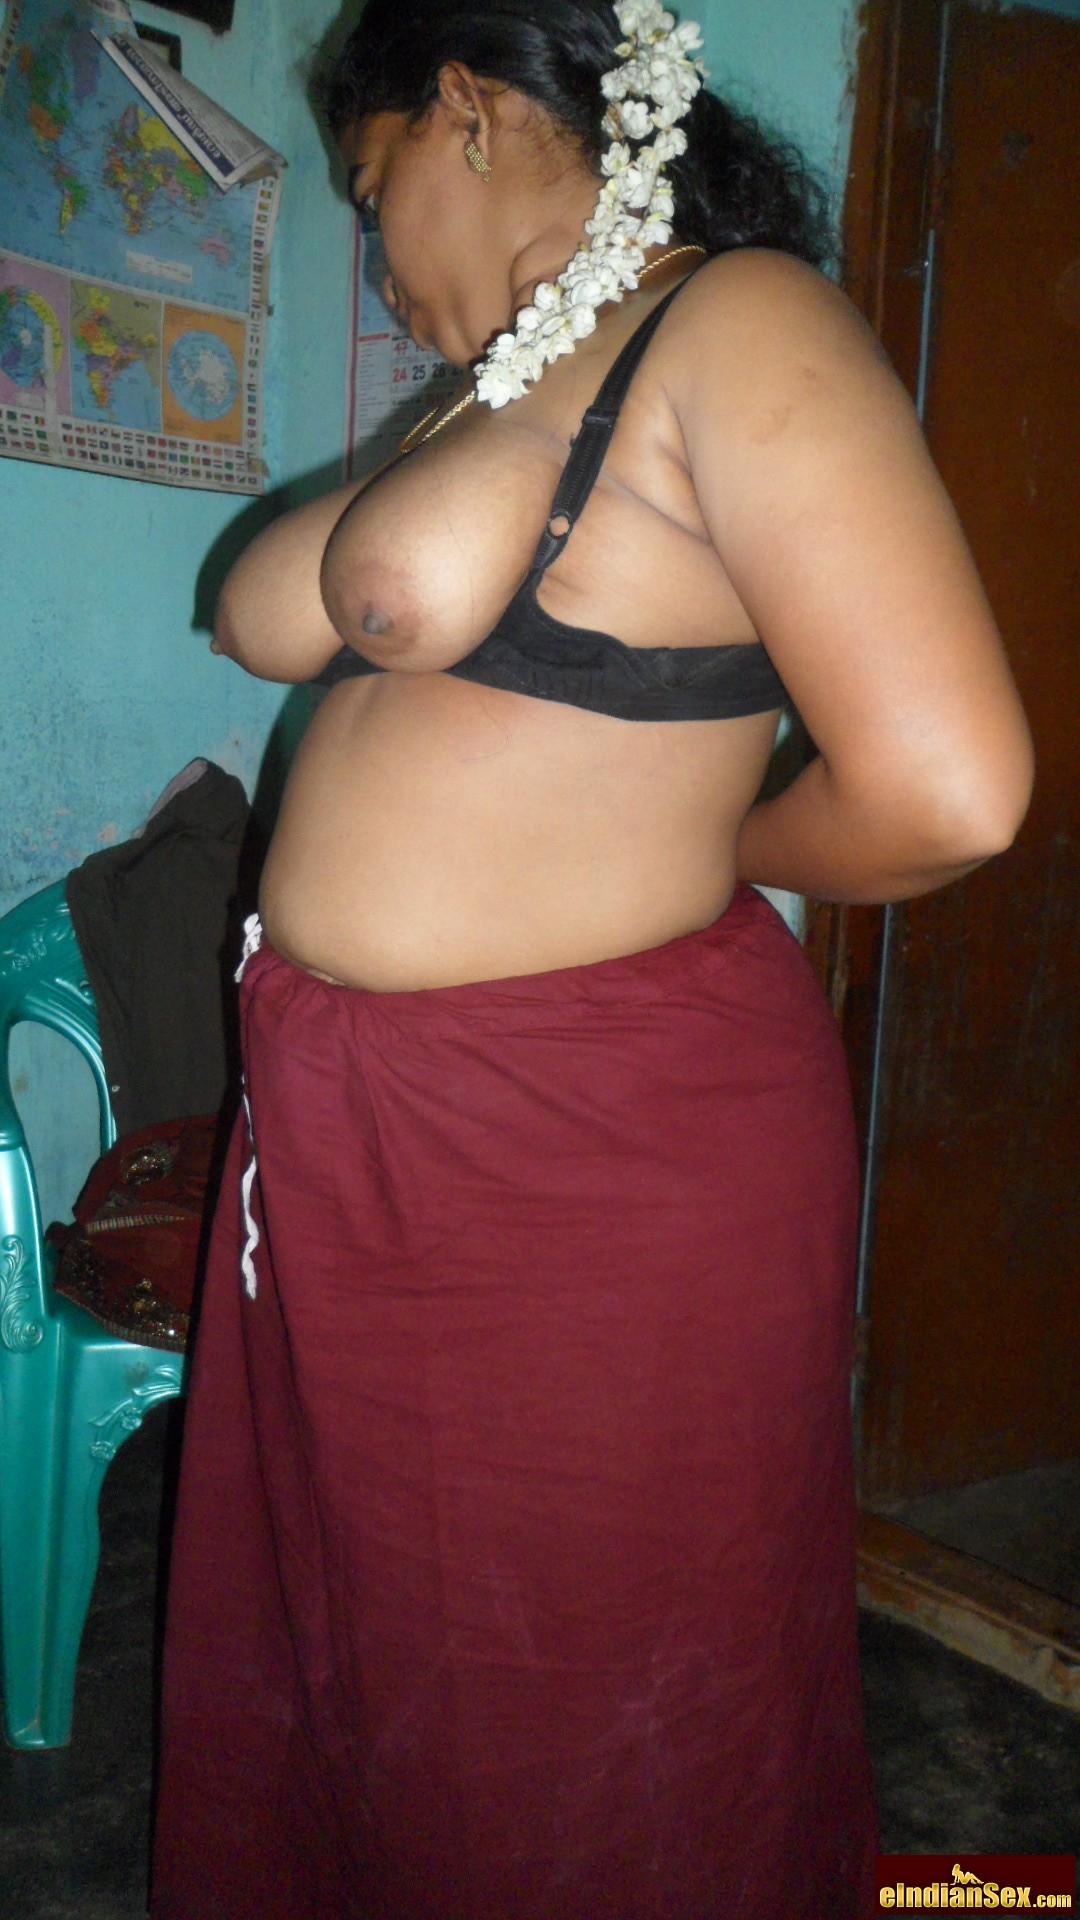 Aunty saree gap porn pictures